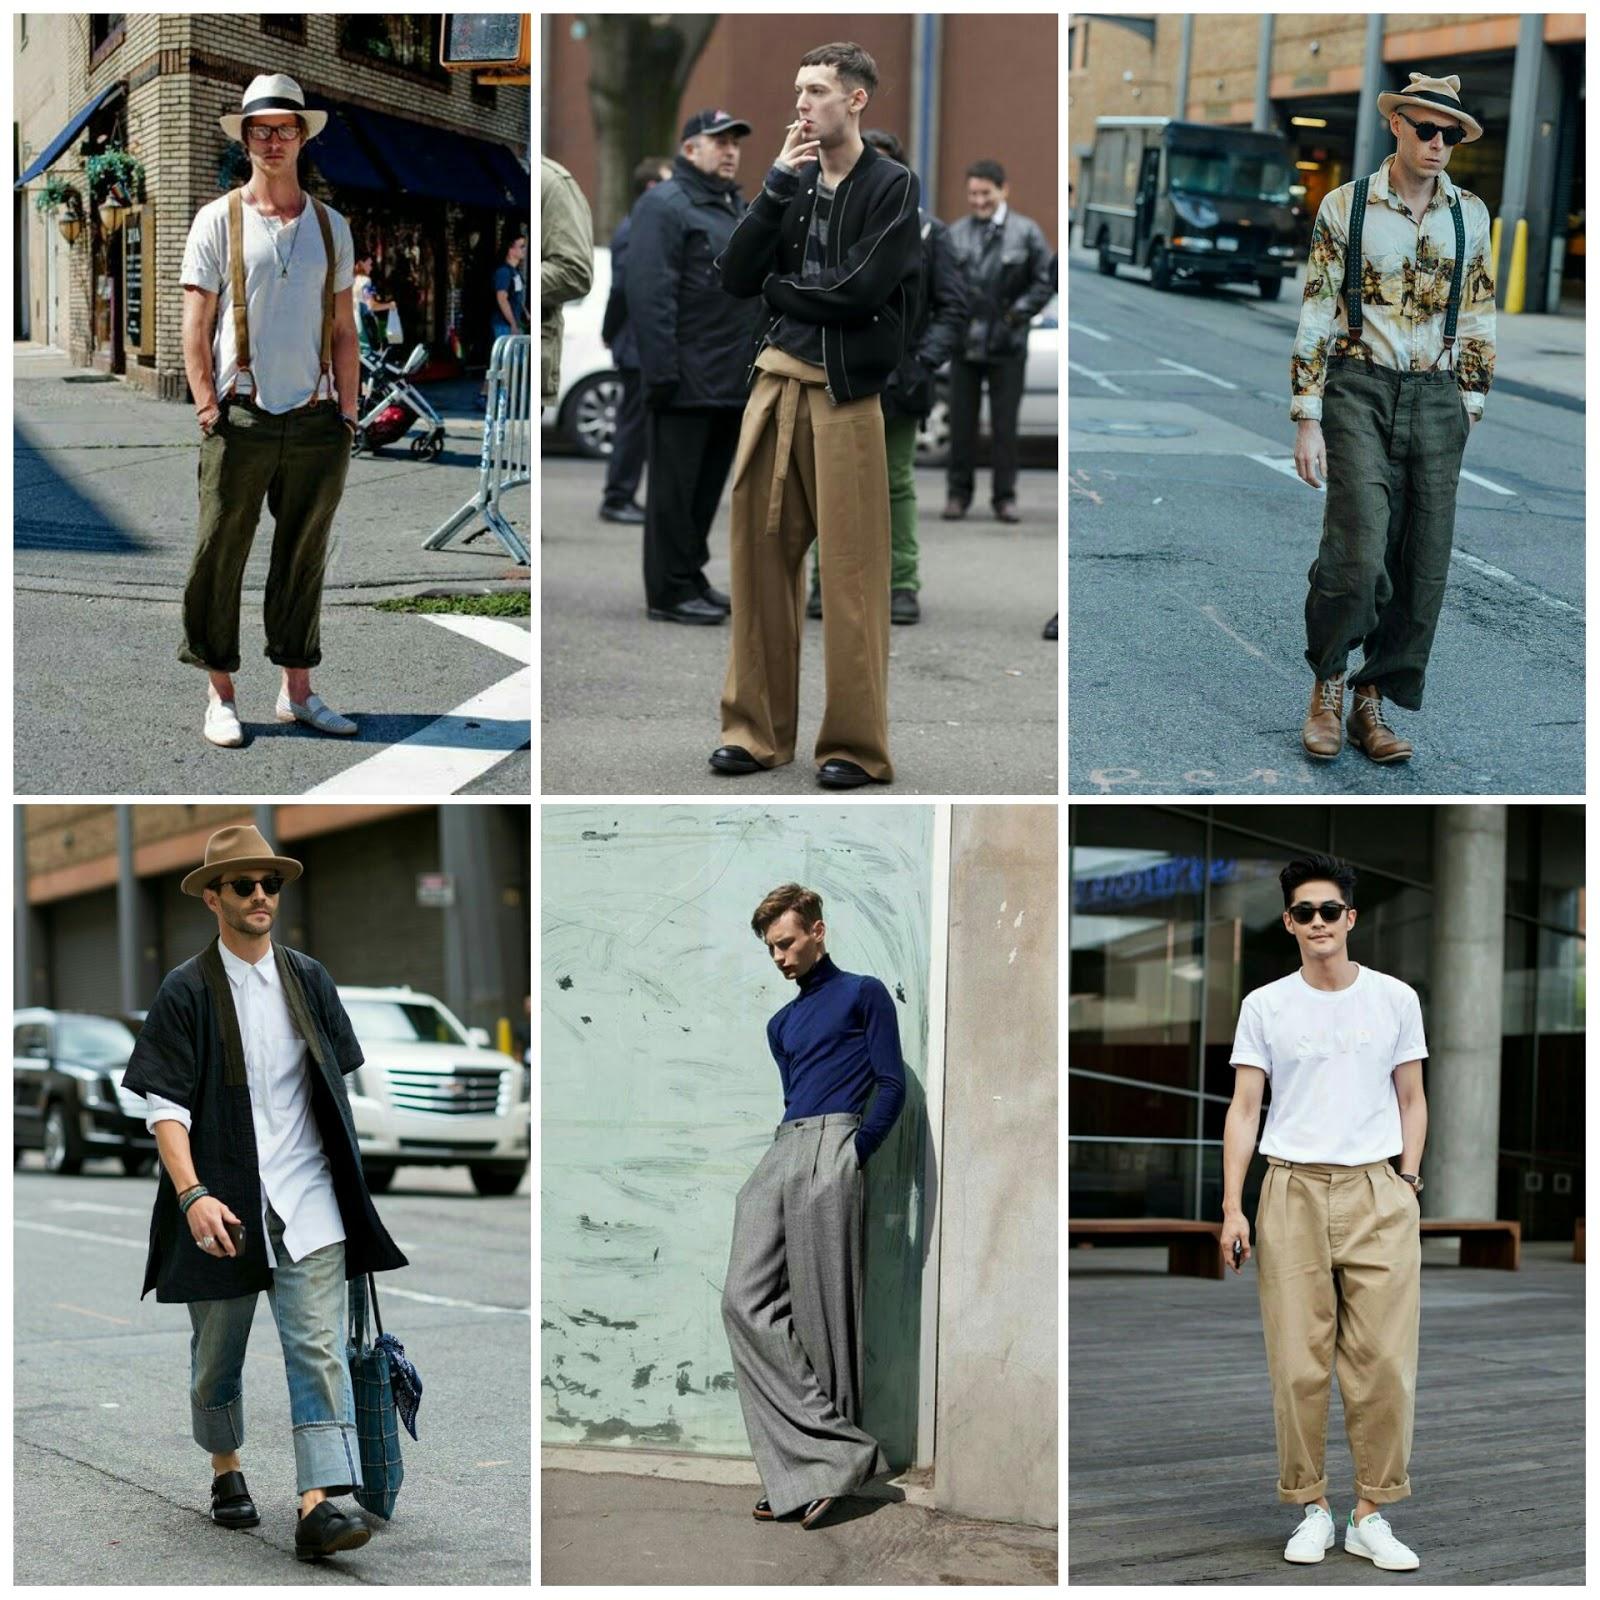 I ♥ Street Style // The Wide Leg Trouser